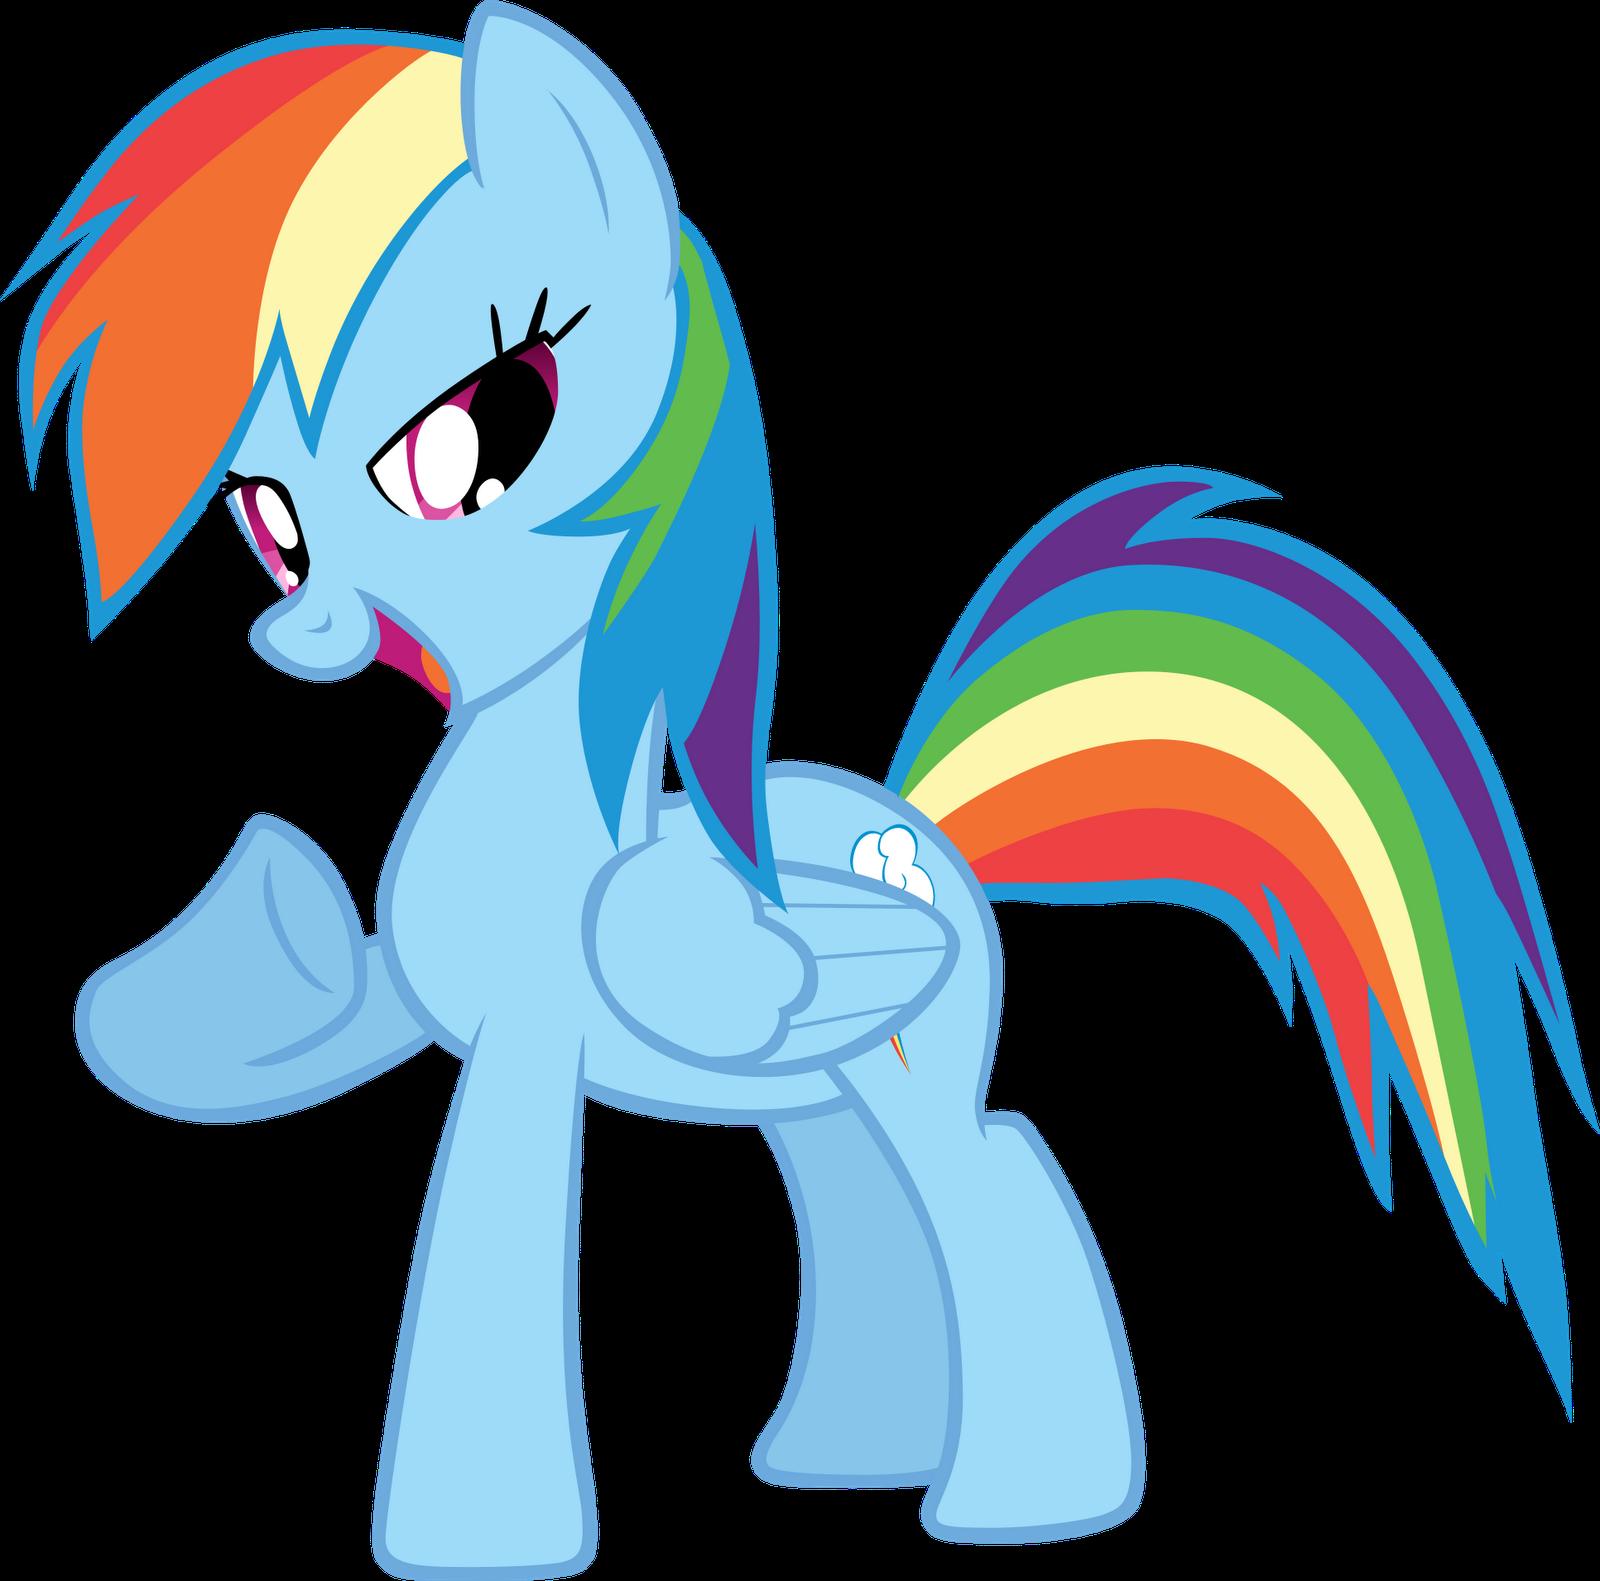 FileFANMADE proud Rainbow Rainbow Dash Mlp Vector